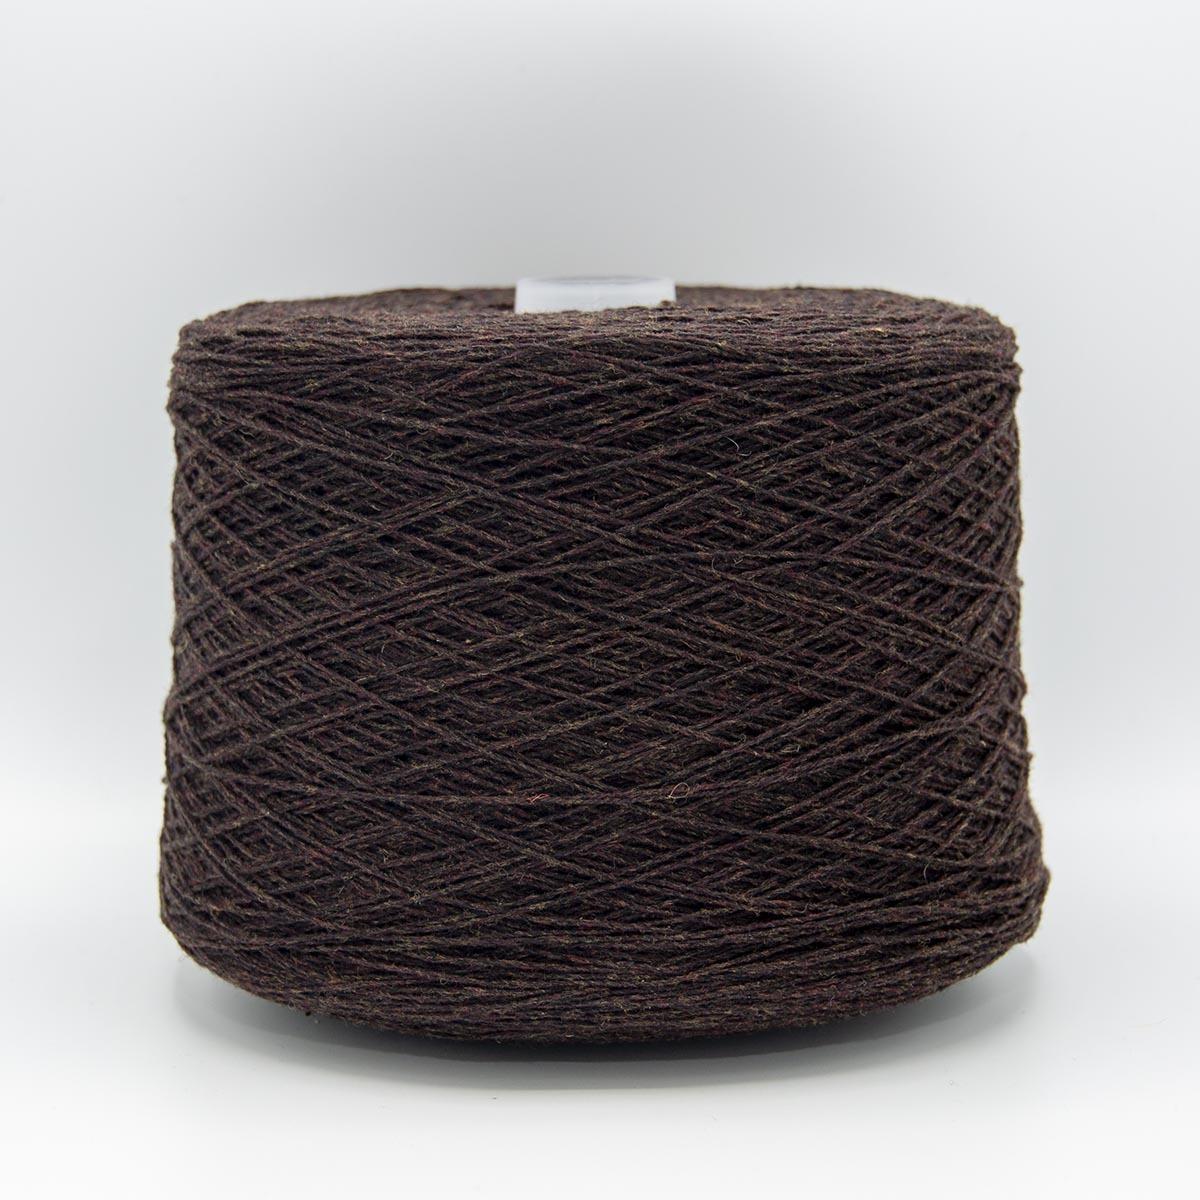 Knoll Yarns Merino Lambswool - 298